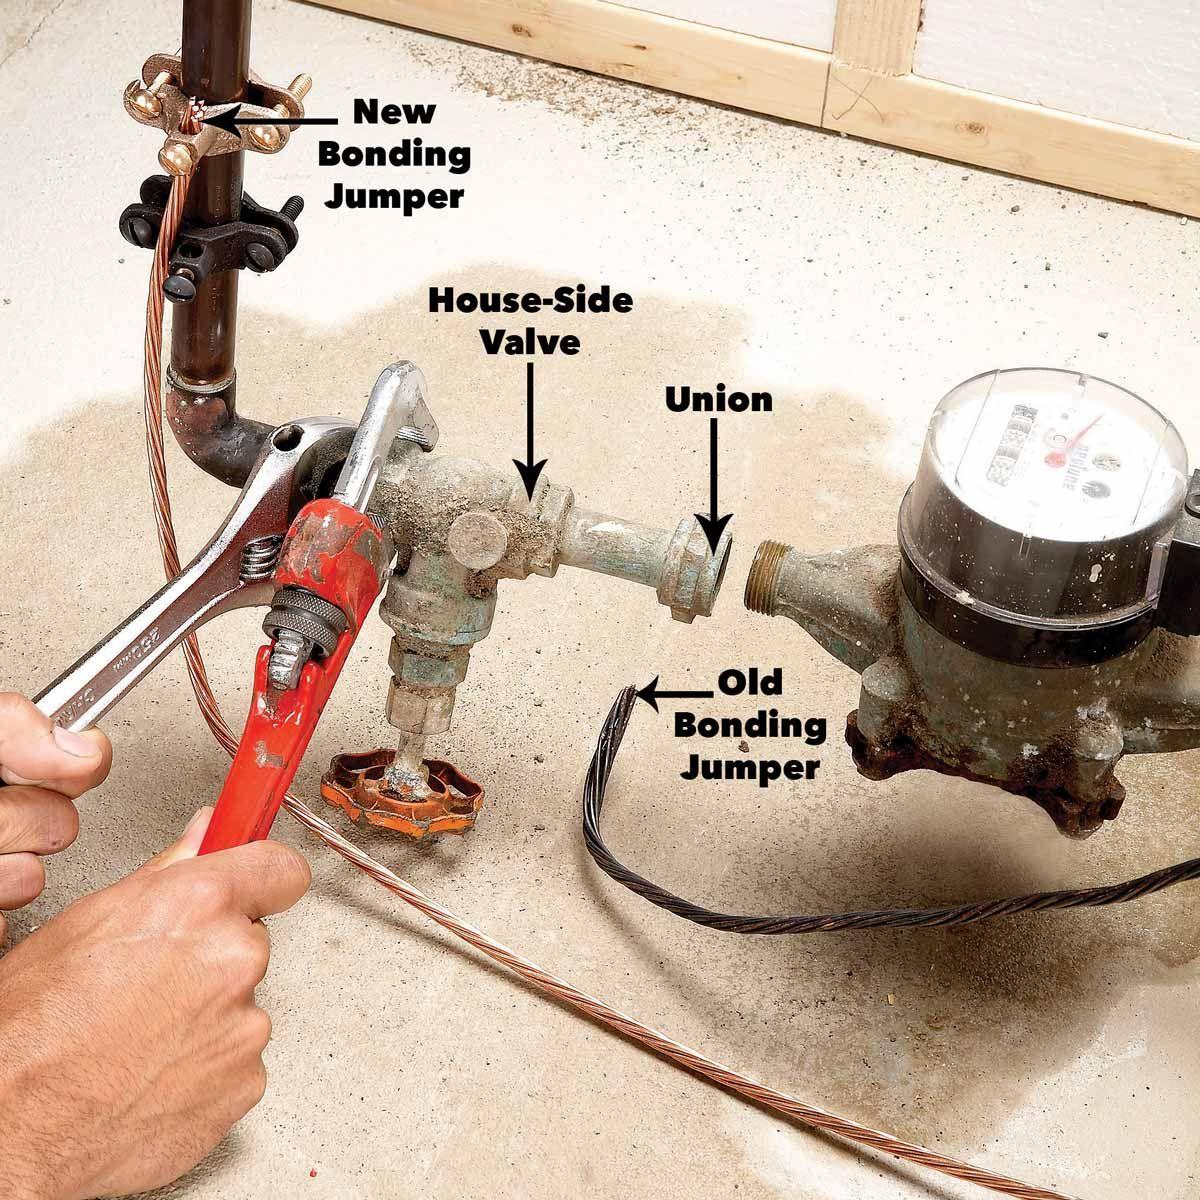 Home Repair How To Replace The Main Shut Off Valve Home Repair